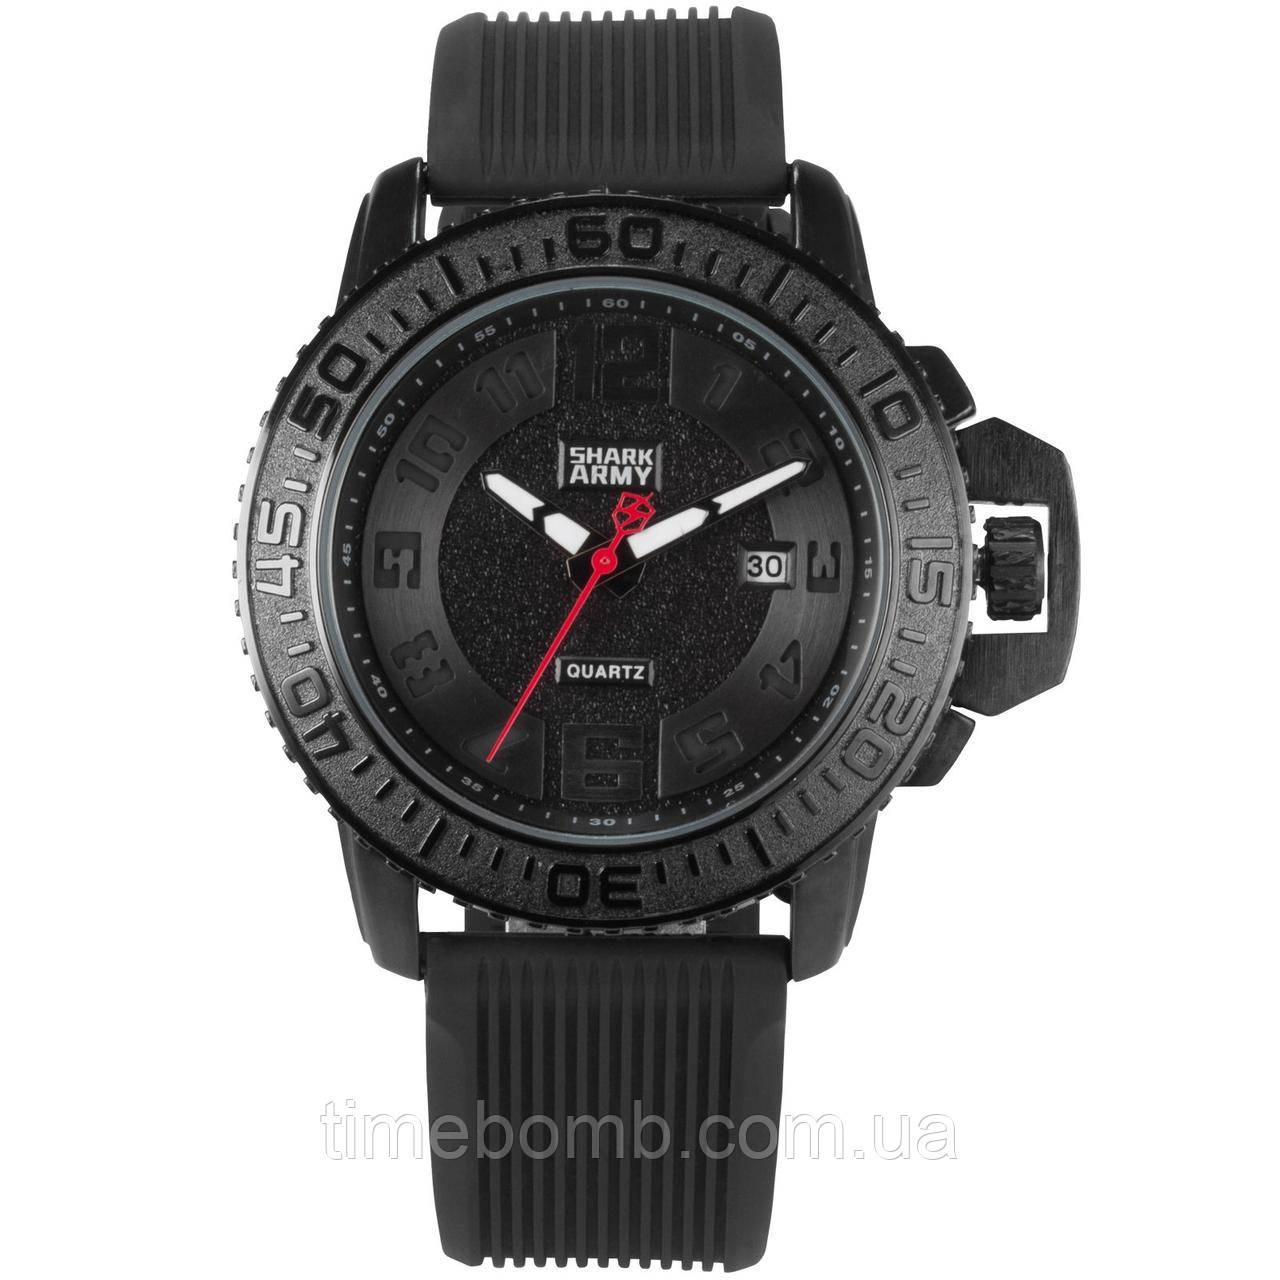 Мужские армейские часы Shark Army Woodoo 2 черные